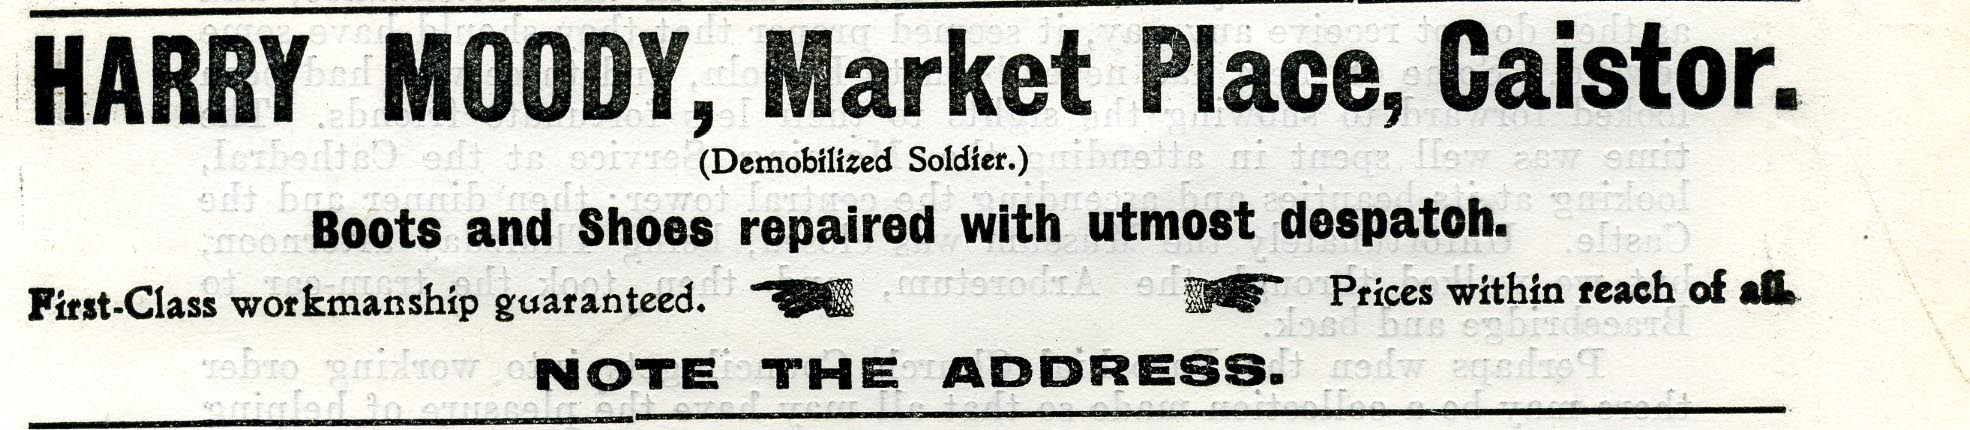 Advert 1917 approx Harry Moody.jpg